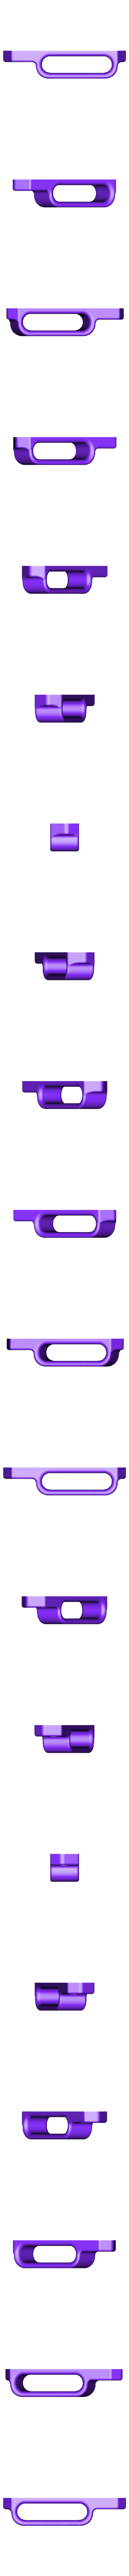 door_handle_LH_V2.1.stl Download free STL file IKEA Lack Door handle and latch mount • 3D printer template, gnattycole